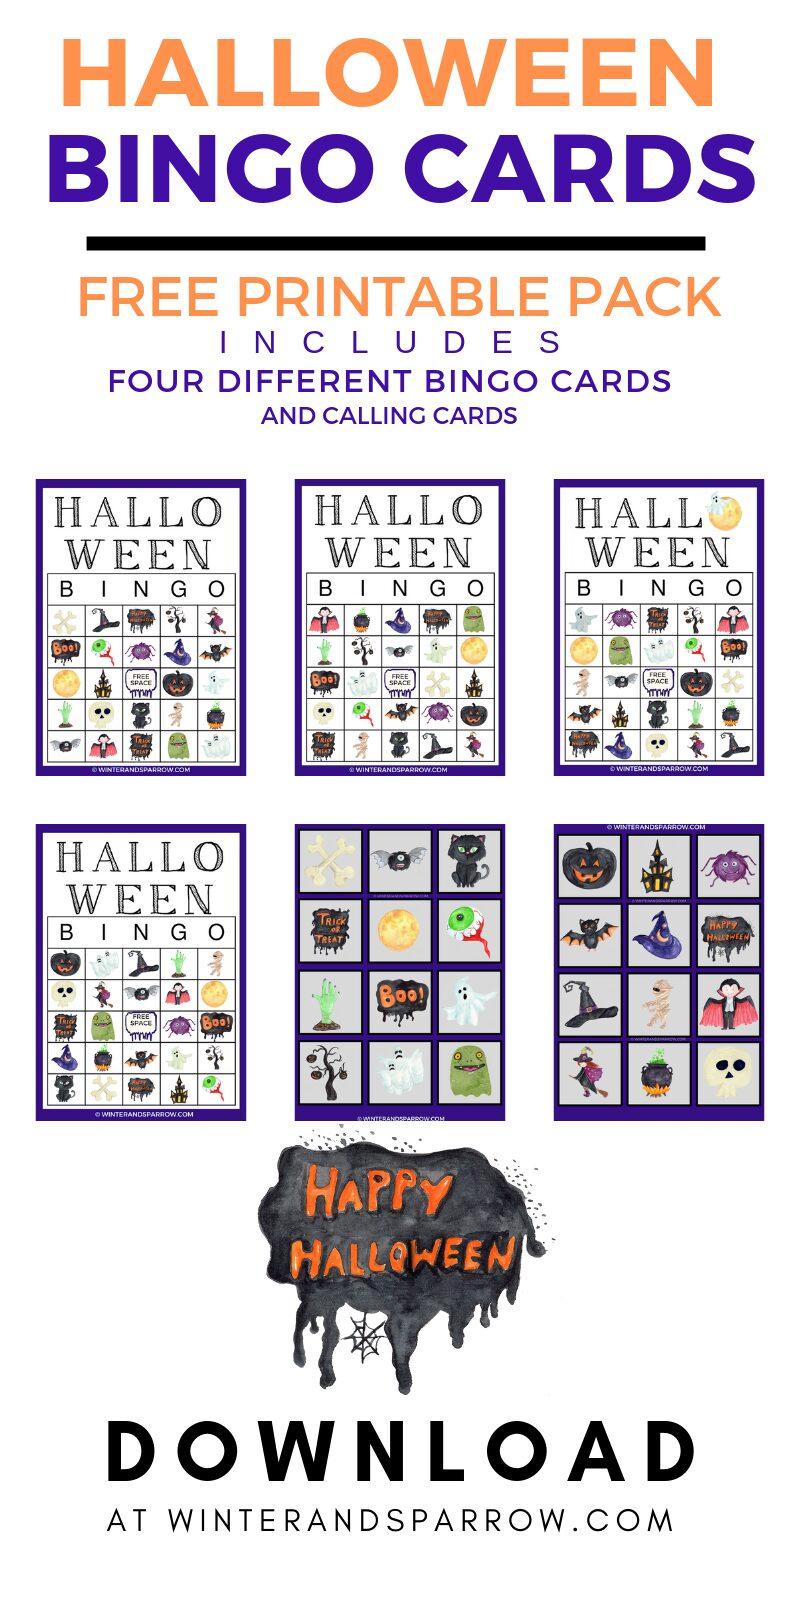 Halloween Printable BINGO Cards:  Includes Four Different Cards Plus Calling Cards | winterandsparrow.com #halloweenbingo #halloweenprintables #bingocards #printablebingocards